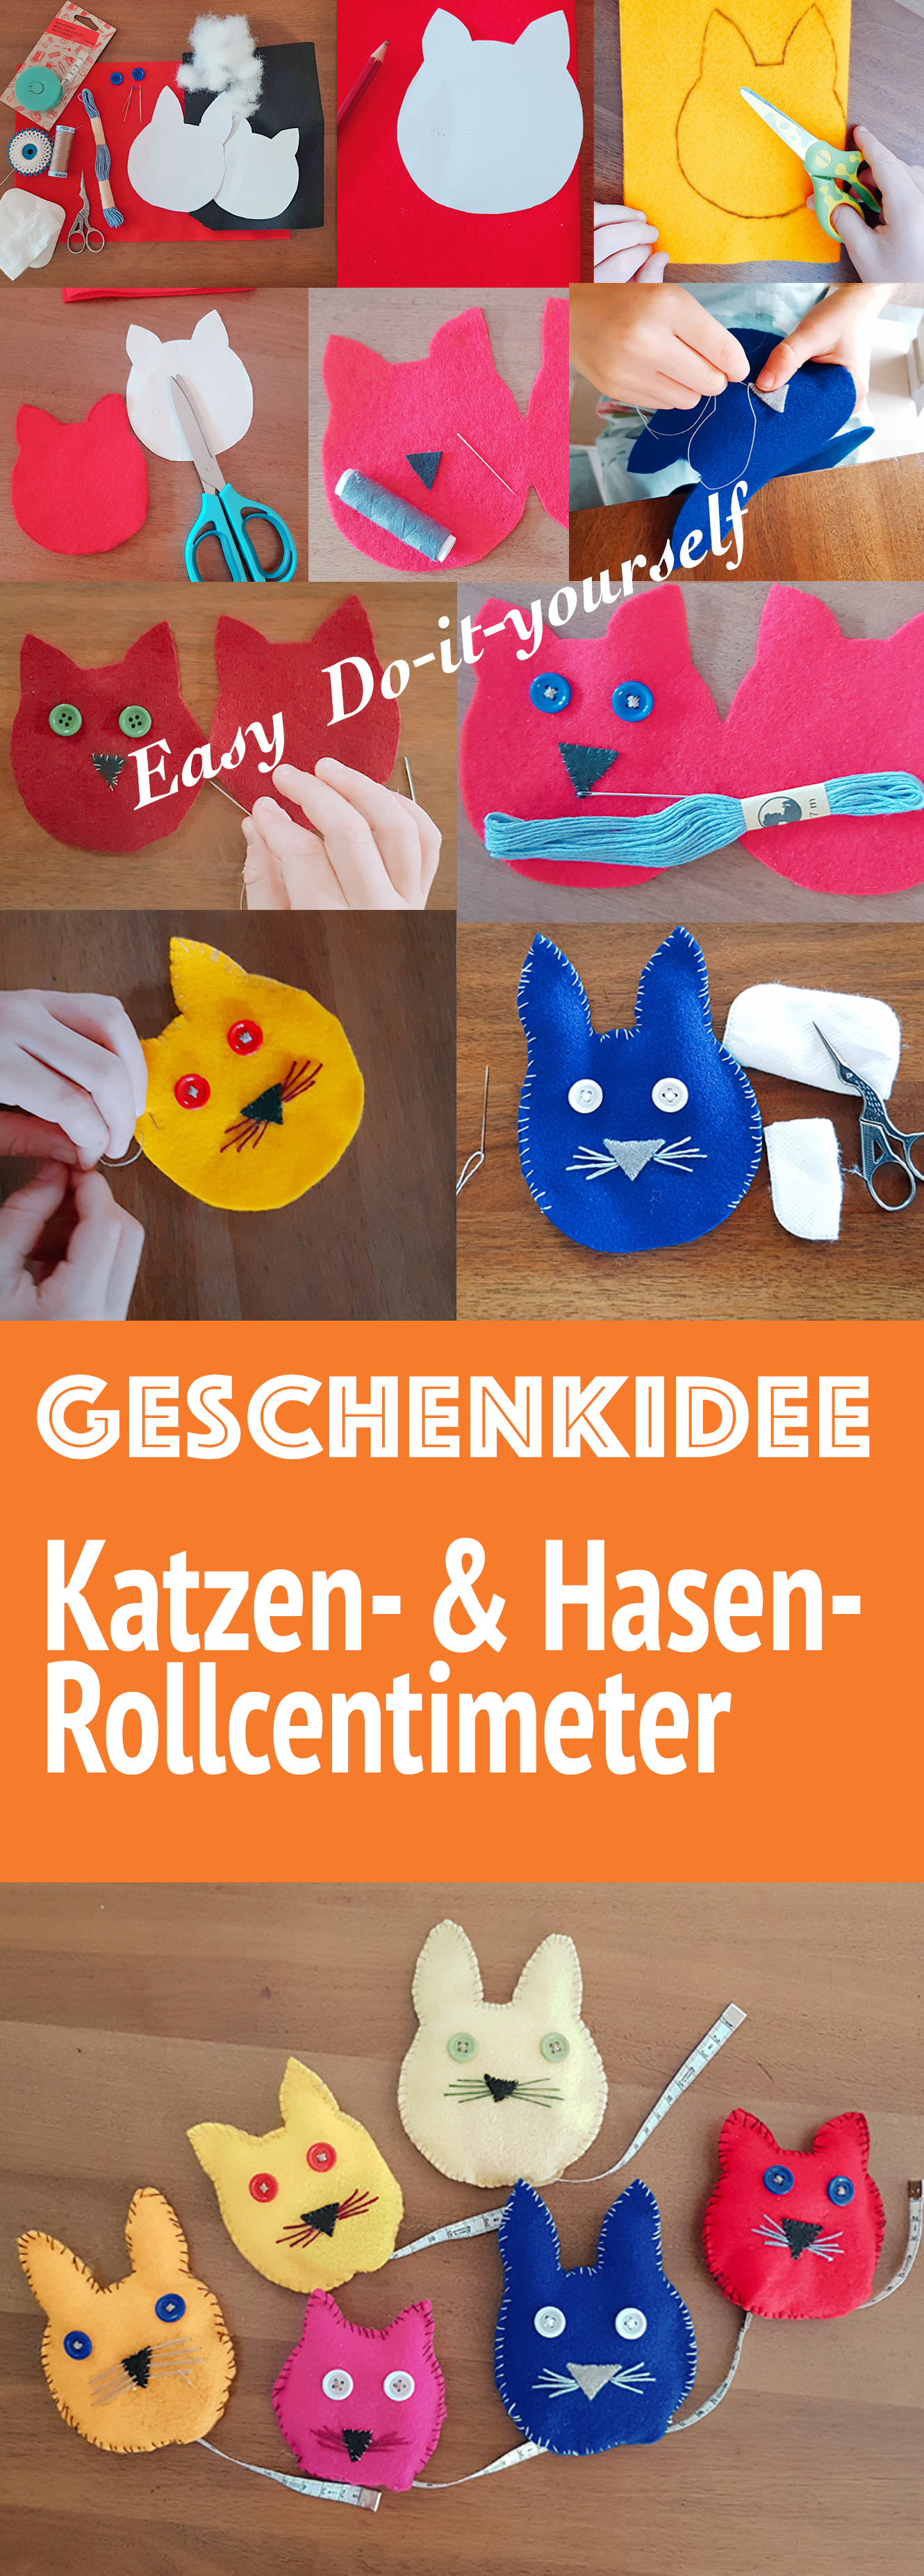 katzen_hasen_rollcentimenter_xmas18_pinterest